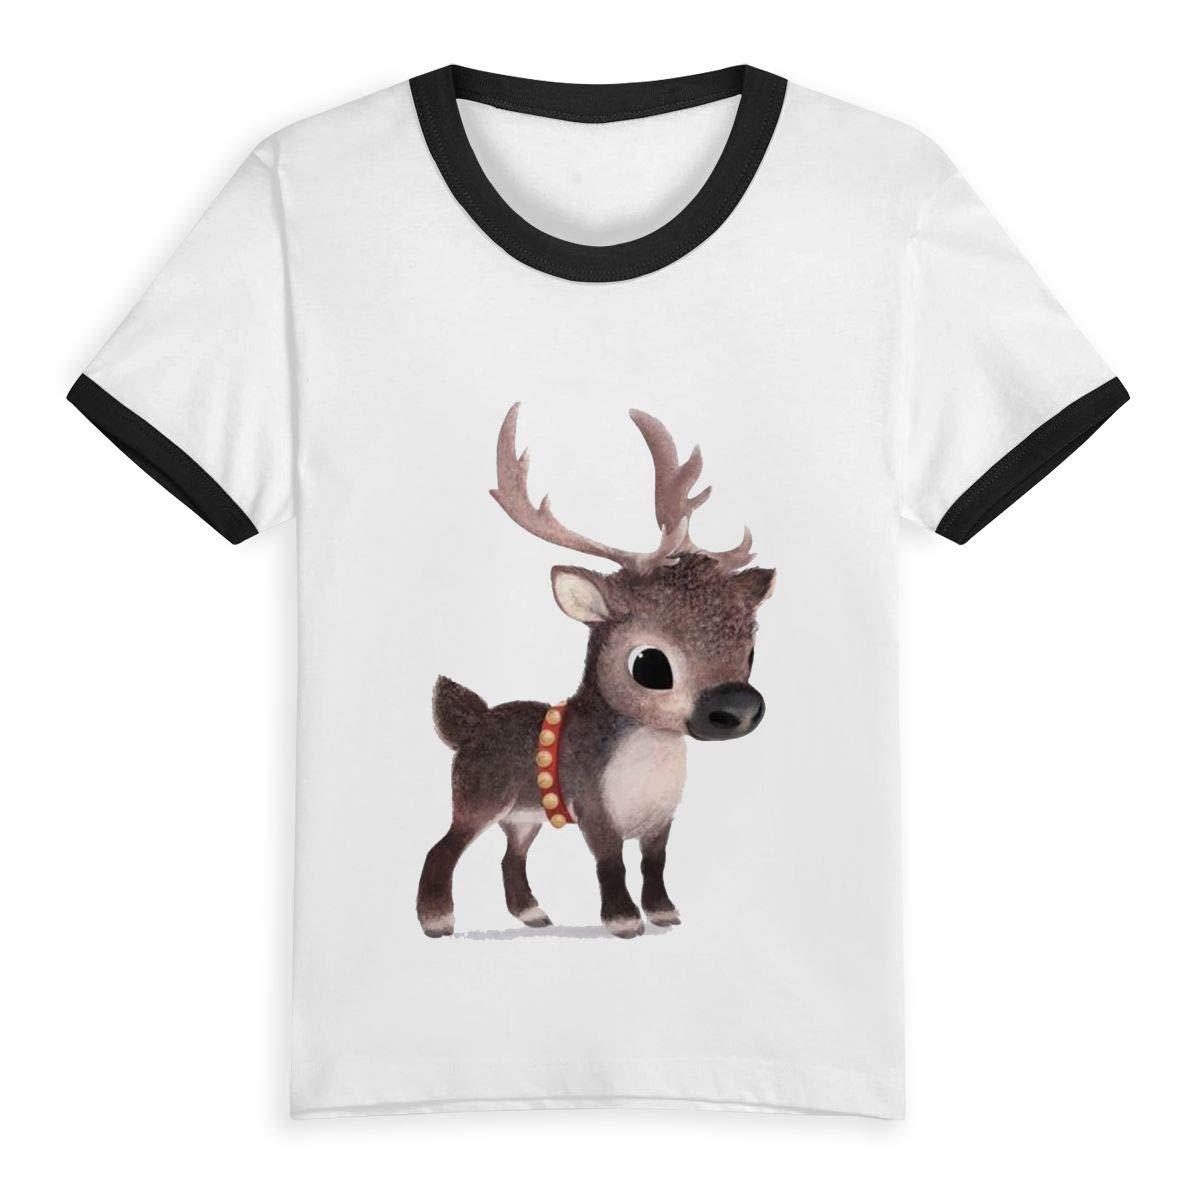 Gomop Reindeer Summer Basic Childrens Short Sleeve Tee Short T Shirts